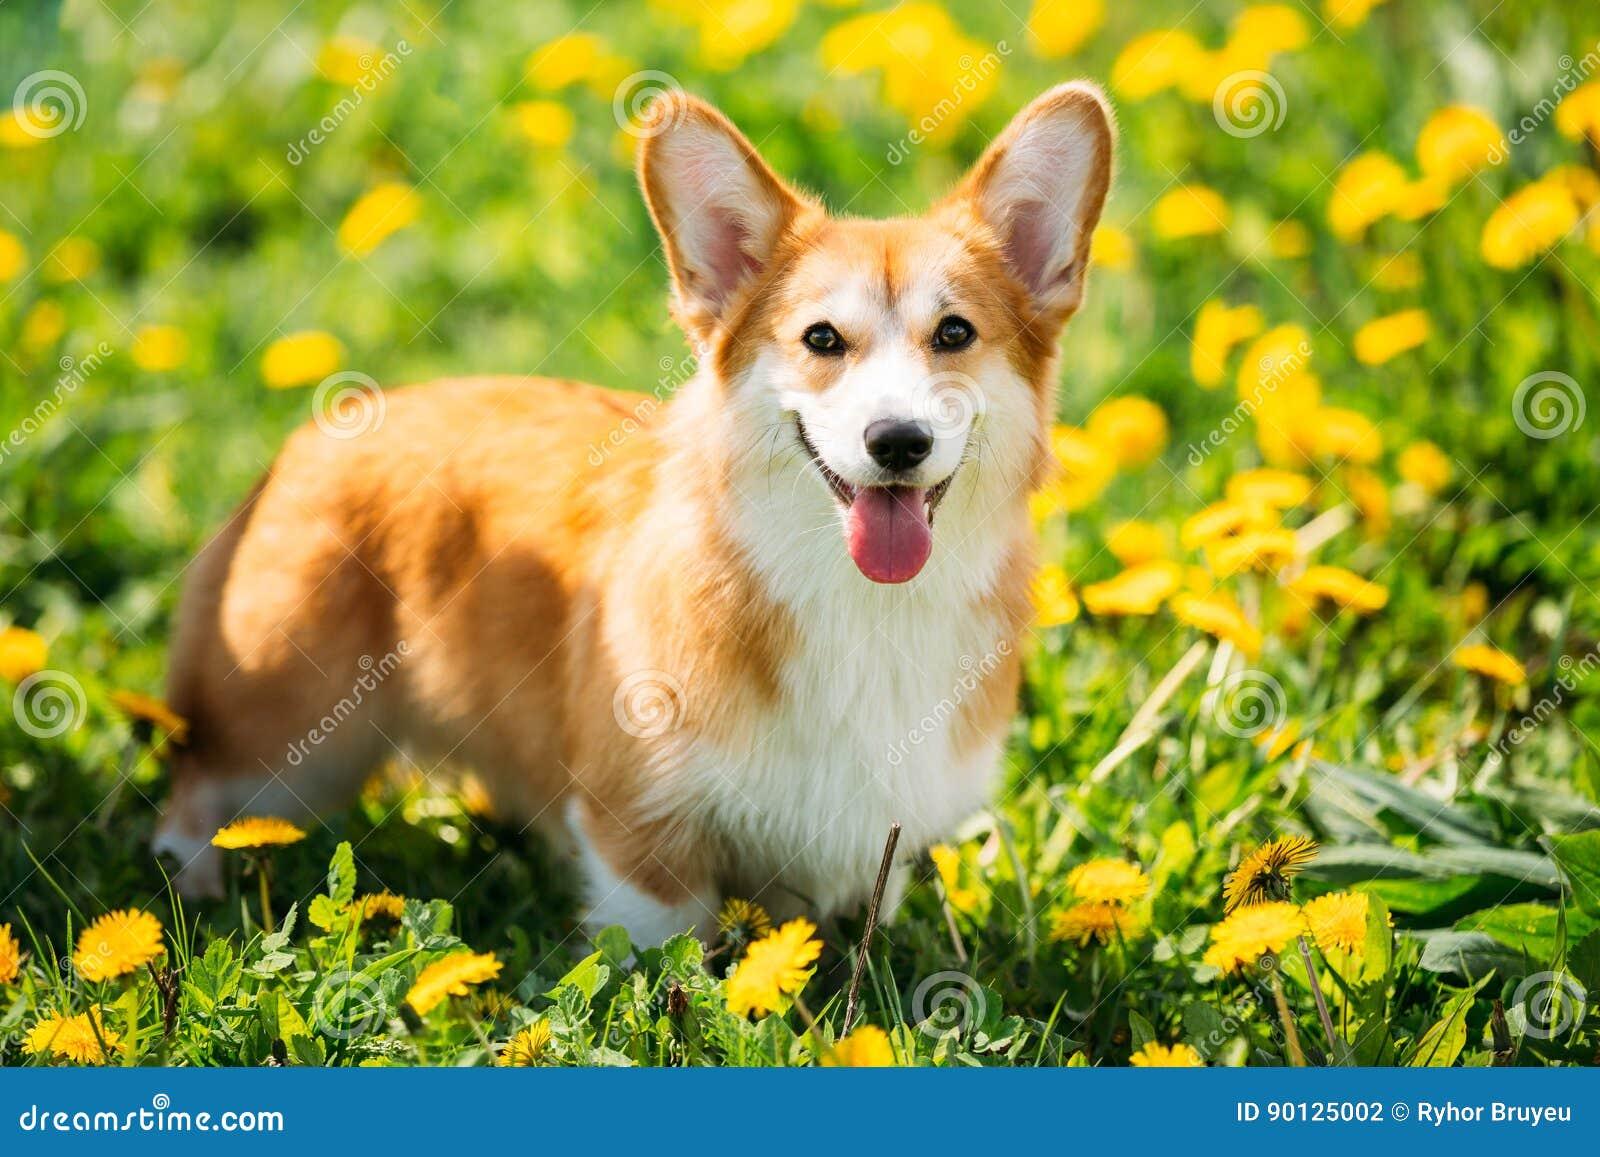 Pembroke Welsh Corgi Dog Puppy Playing In Green Summer Grass.